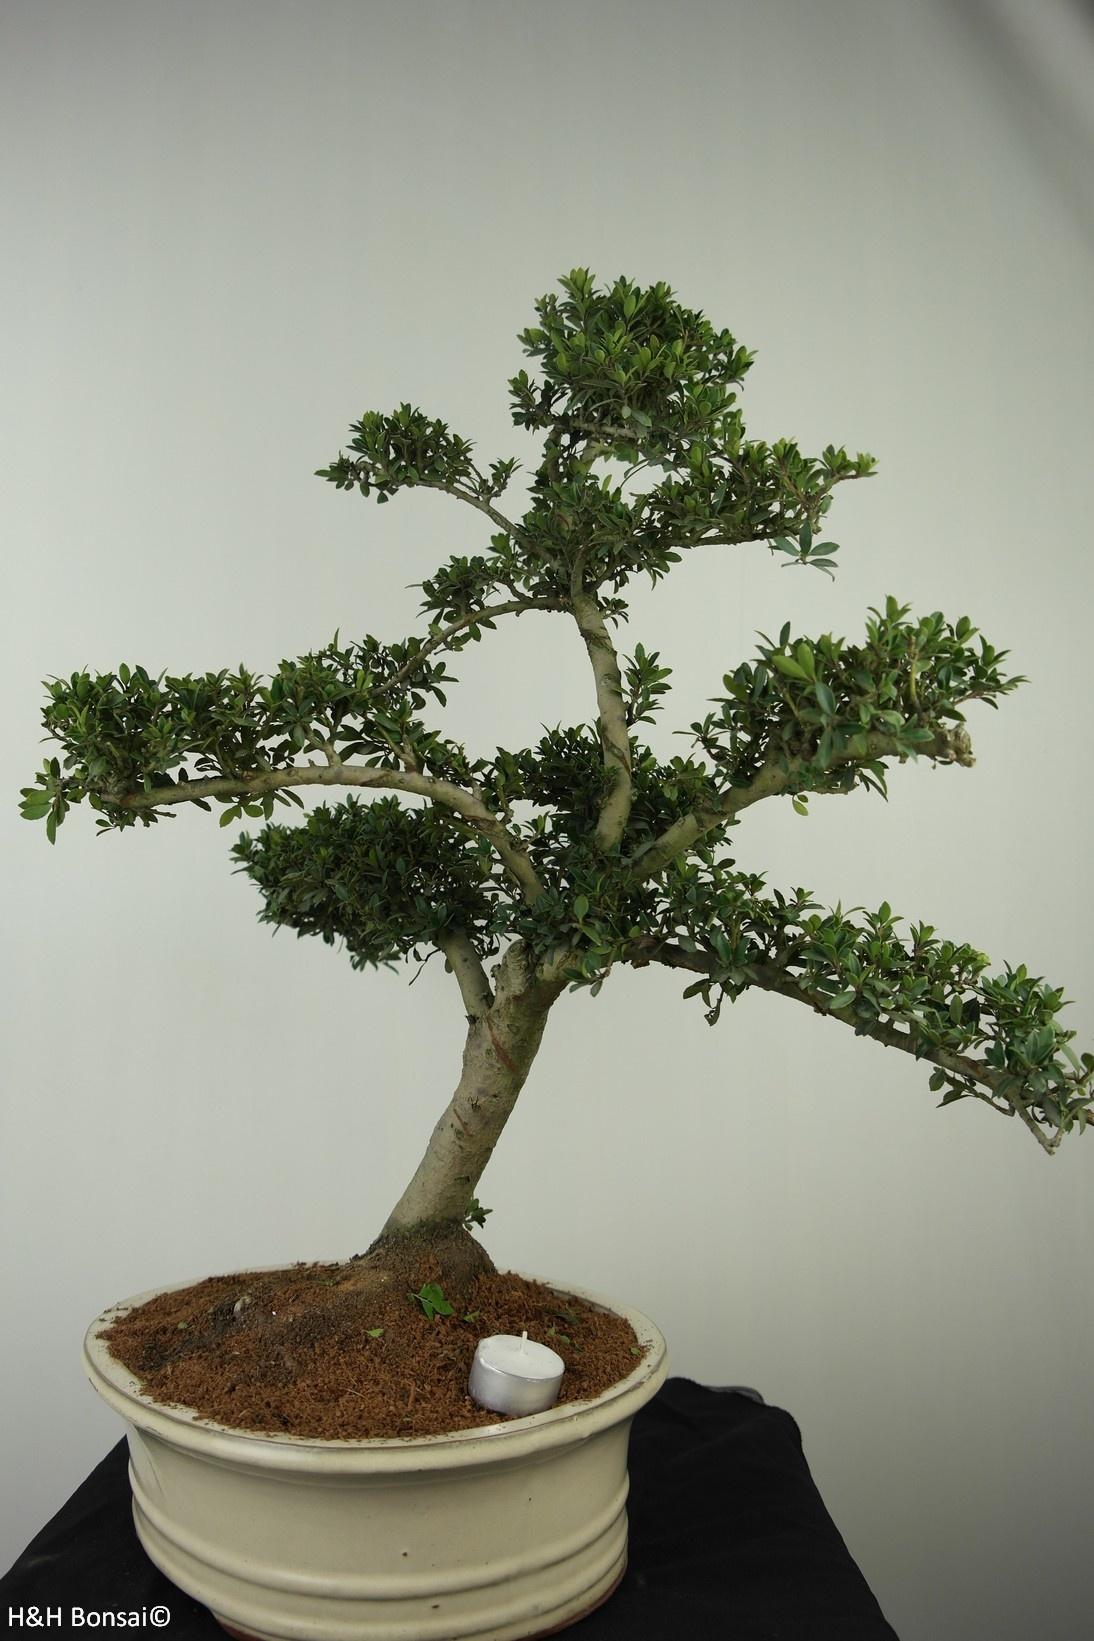 Bonsai Japanische Stechpalme, Ilex crenata, nr. 7743